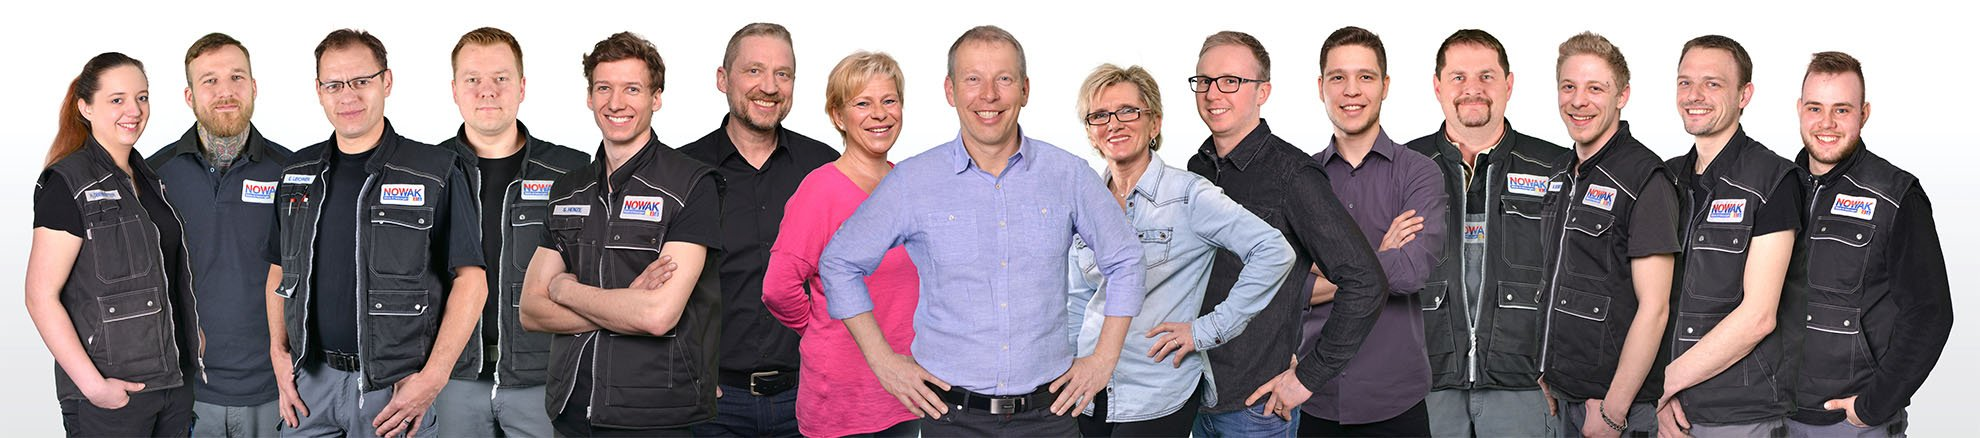 Gruppenfoto-Team-Nowak-2